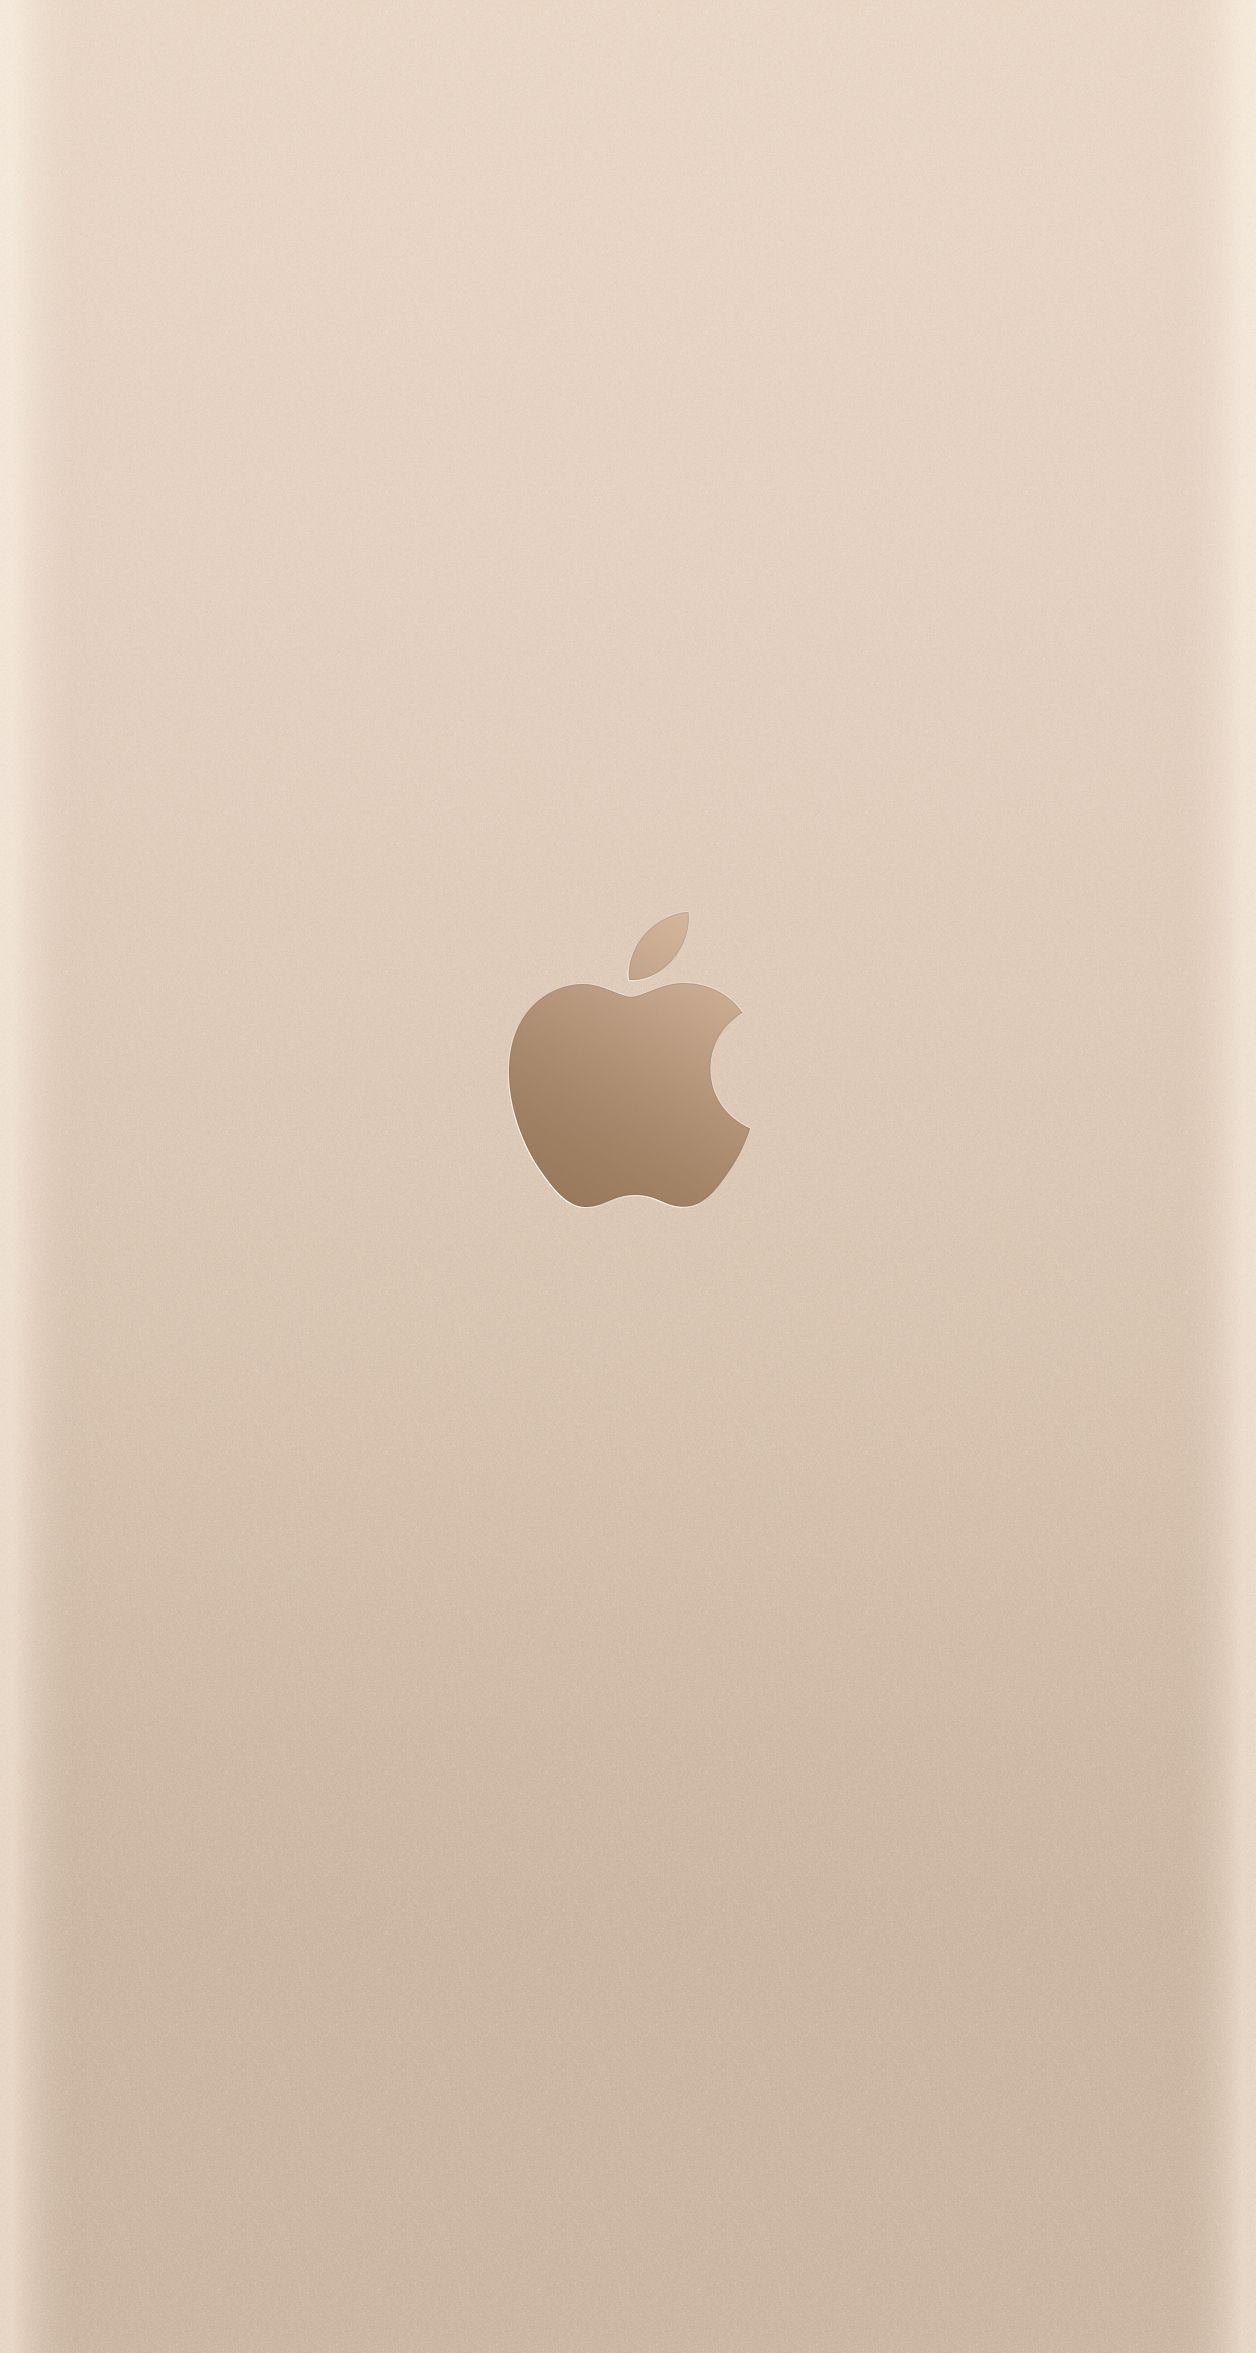 wallpaper iphone 6 plus